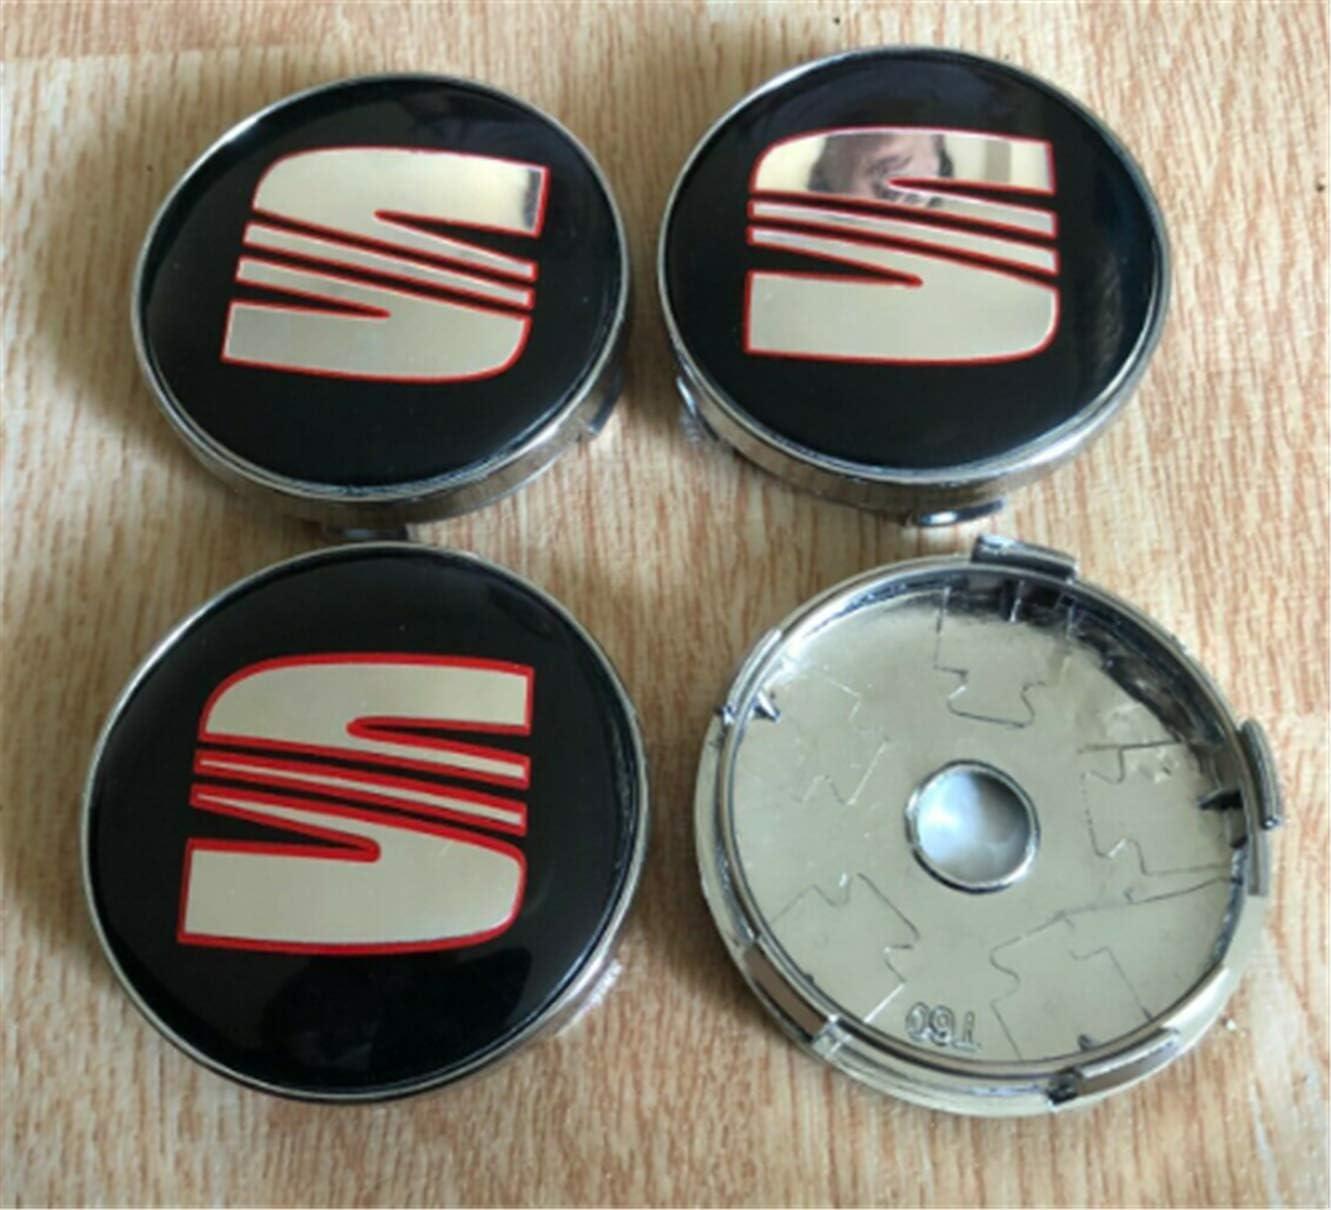 4pcs 60mm For Seat Wheel Center Caps Emblems Rim Caps Hub Caps Badges Red Black